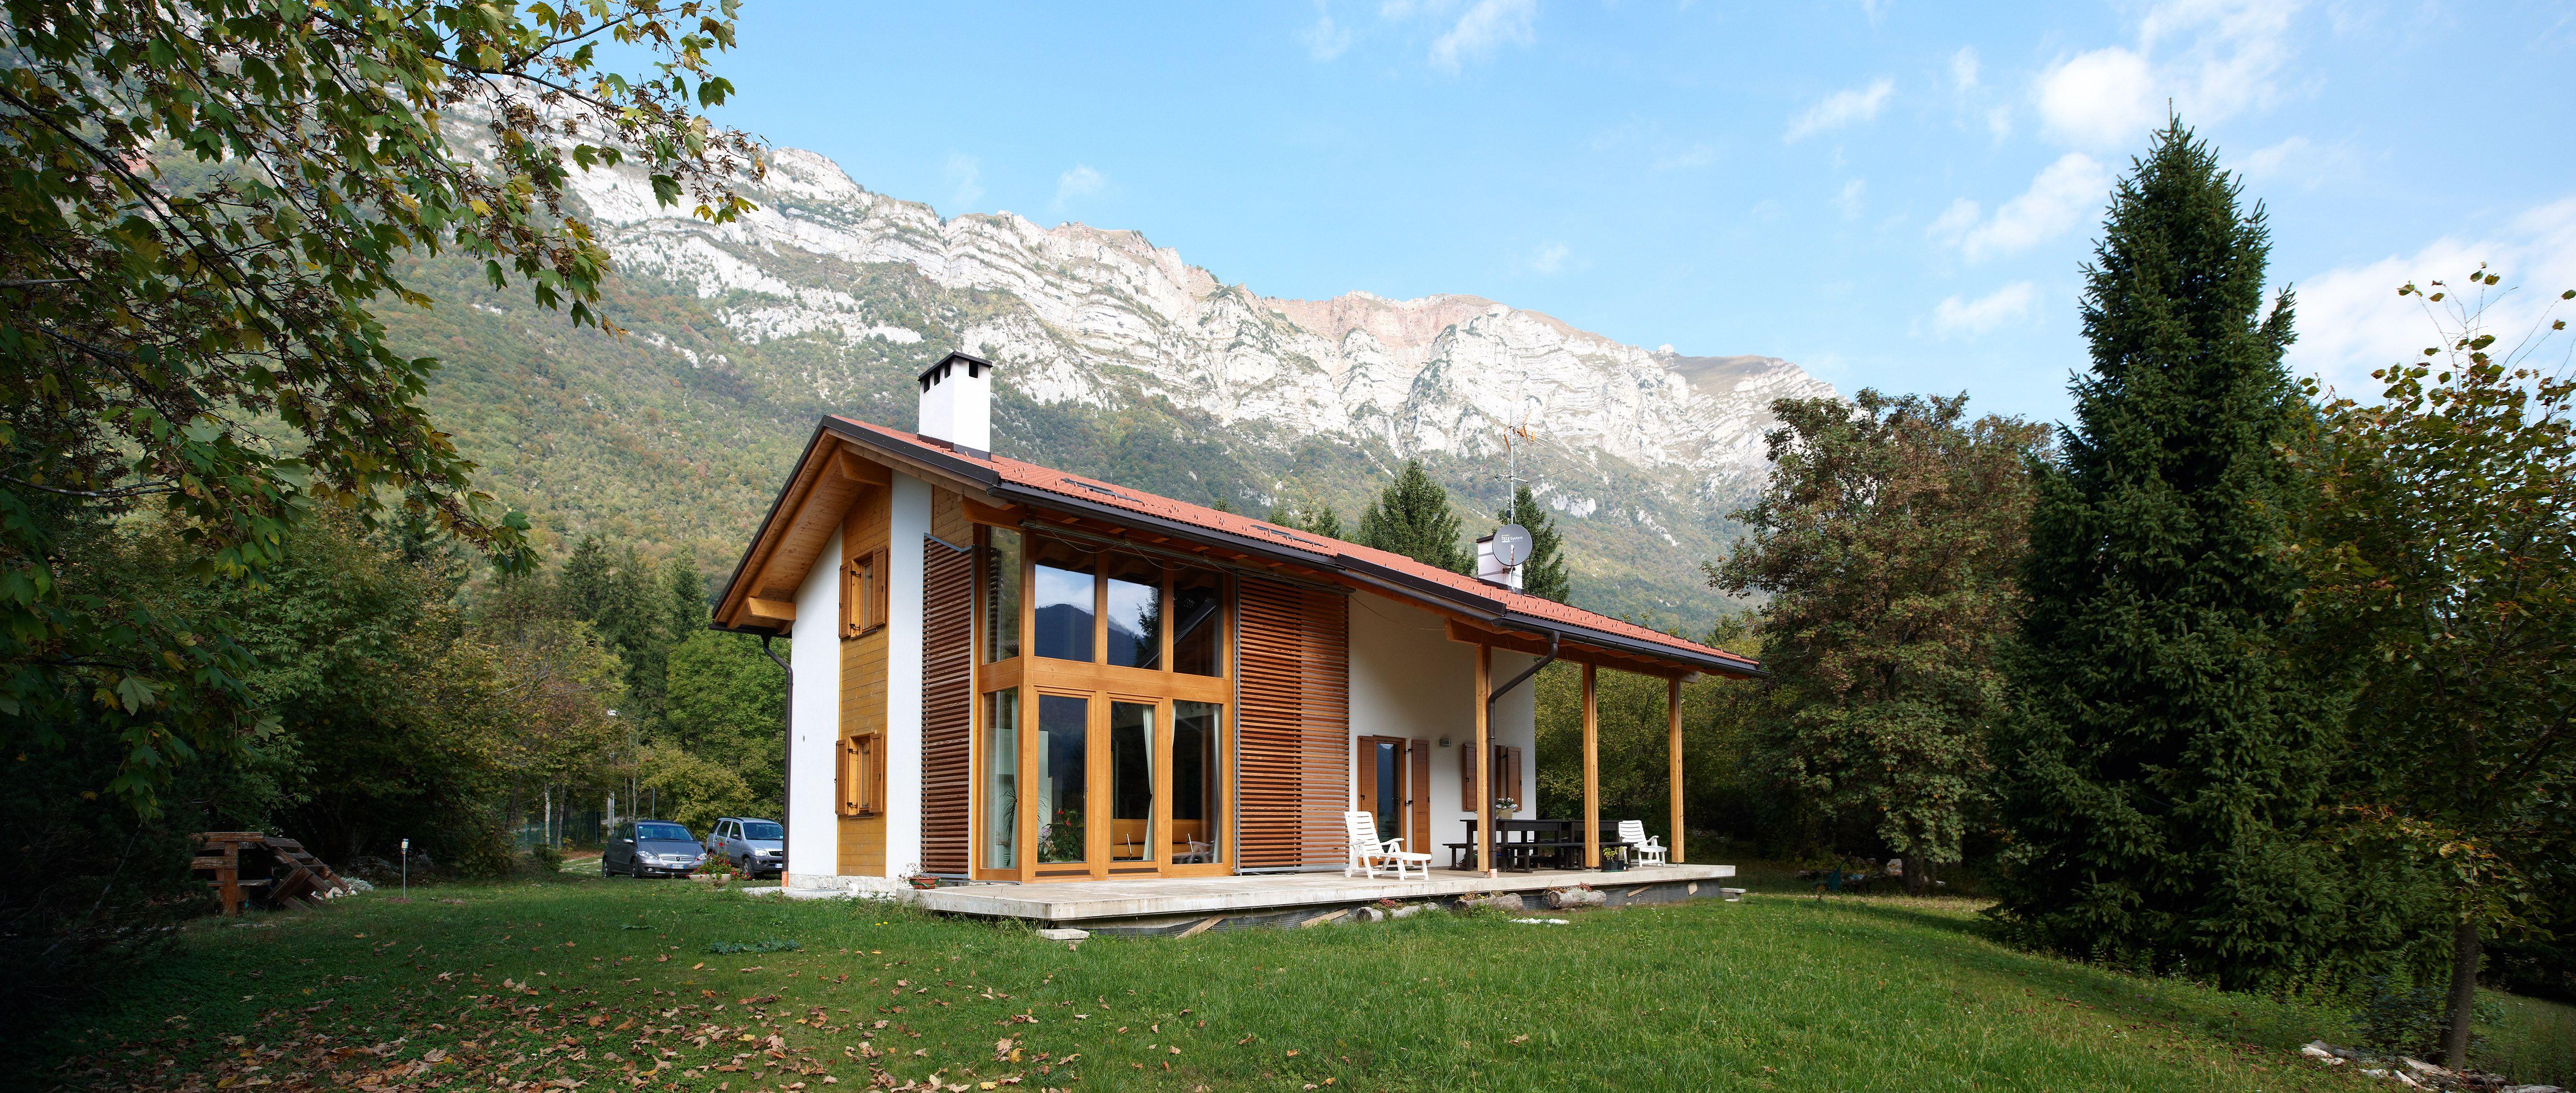 Casa prefabbricata in legno Rubner haus  Casa Residenz